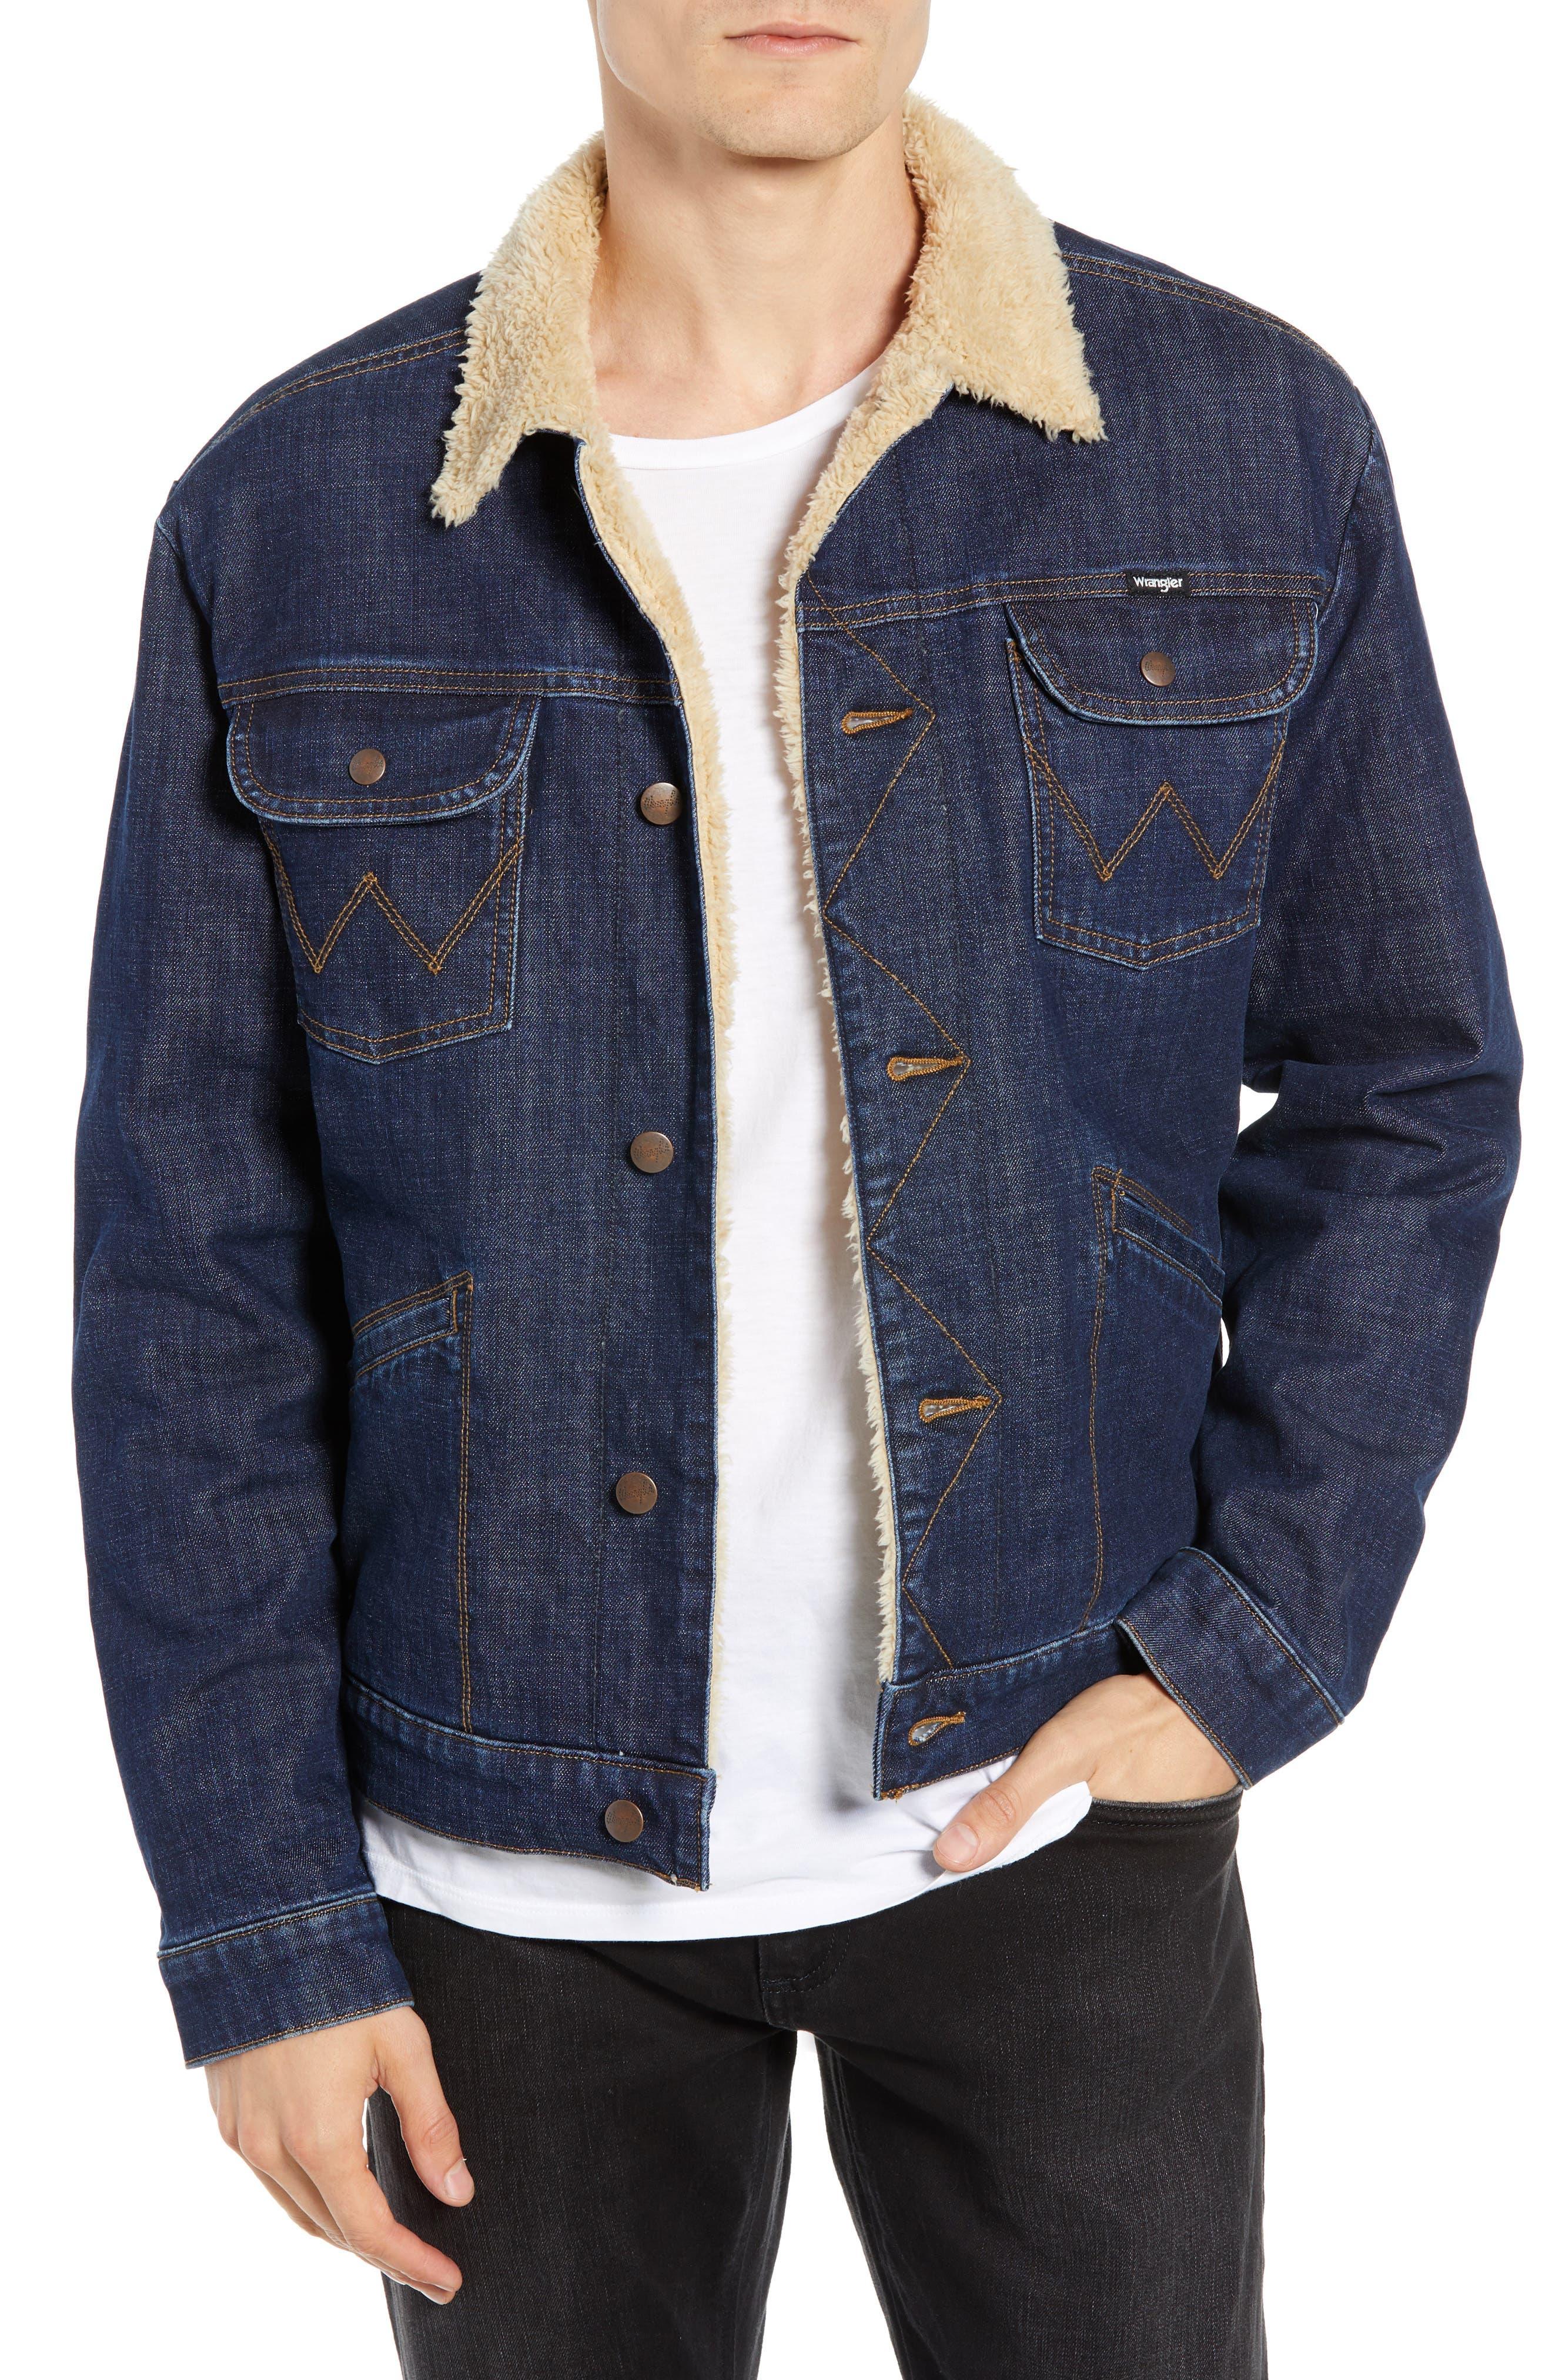 Heritage Fleece Lined Denim Jacket,                             Main thumbnail 1, color,                             DARK